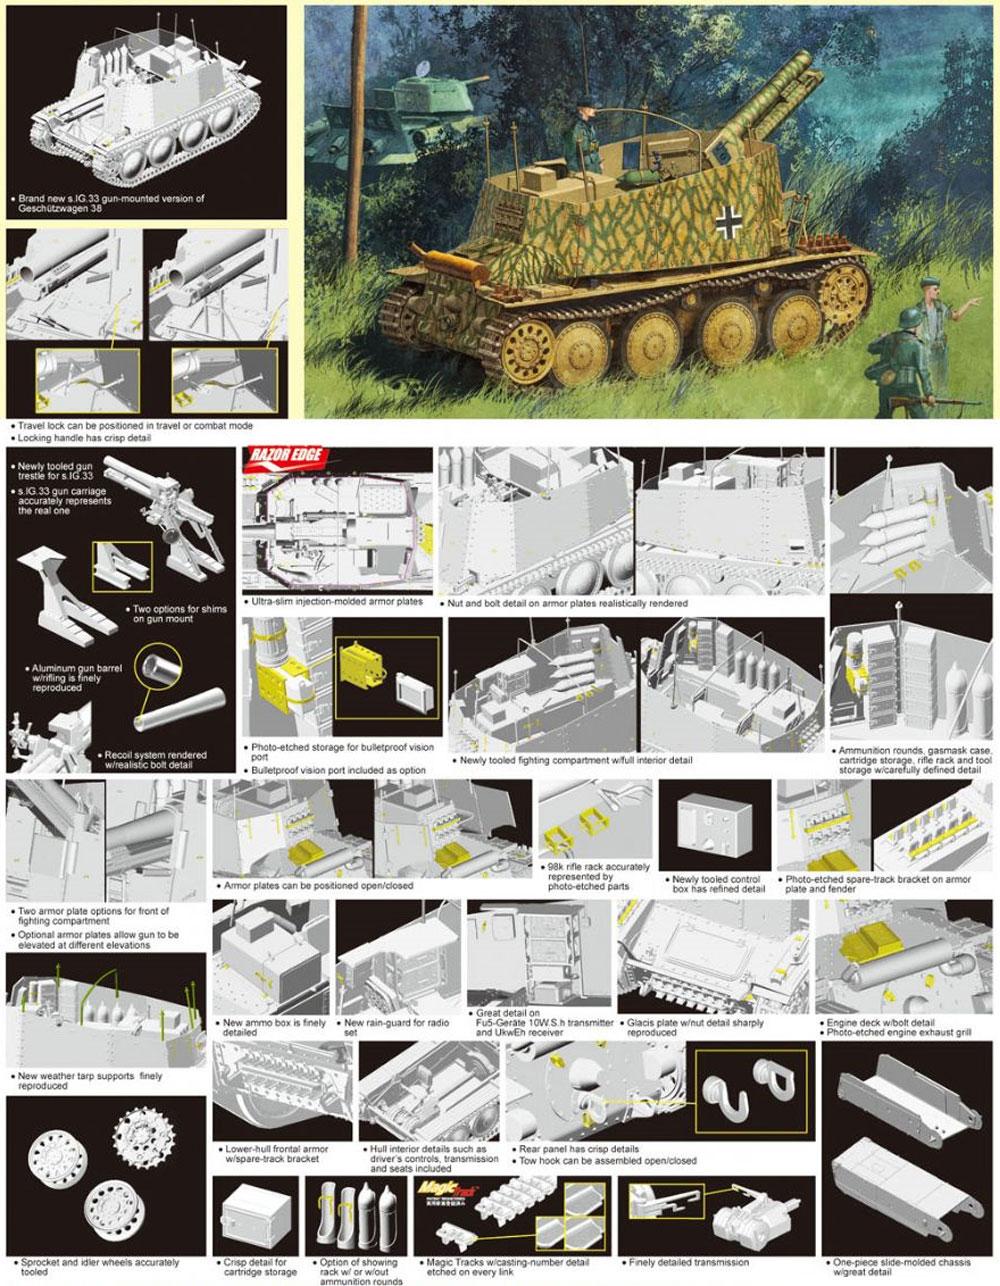 Sd.Kfz.138/1 38t 15cm自走重歩兵砲 グリレH型プラモデル(ドラゴン1/35 '39-'45 SeriesNo.6470)商品画像_2